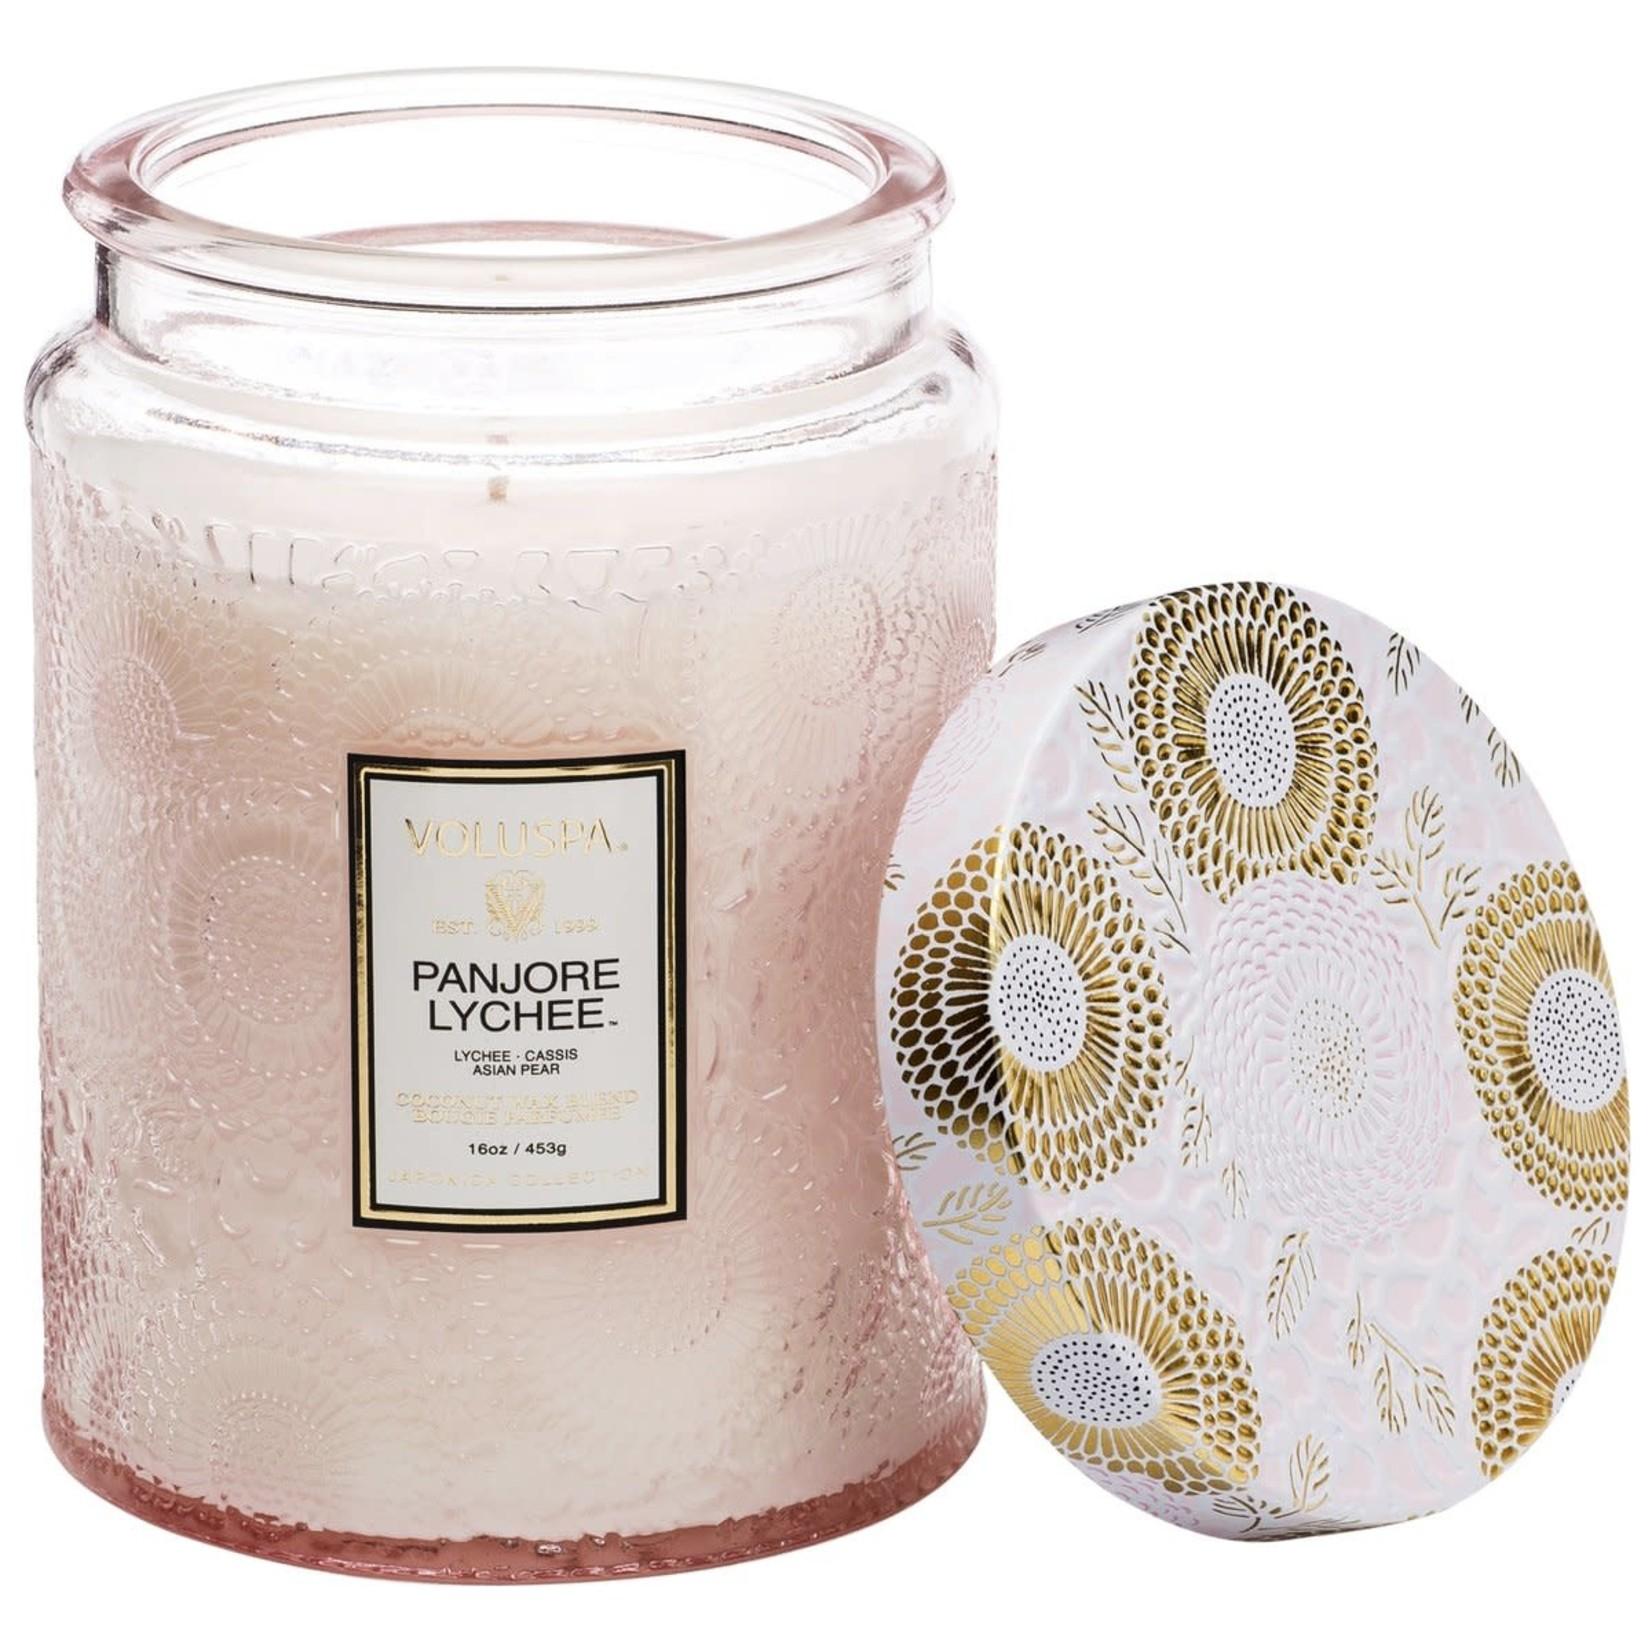 Voluspa Panjore Lychee Large Jar Candle